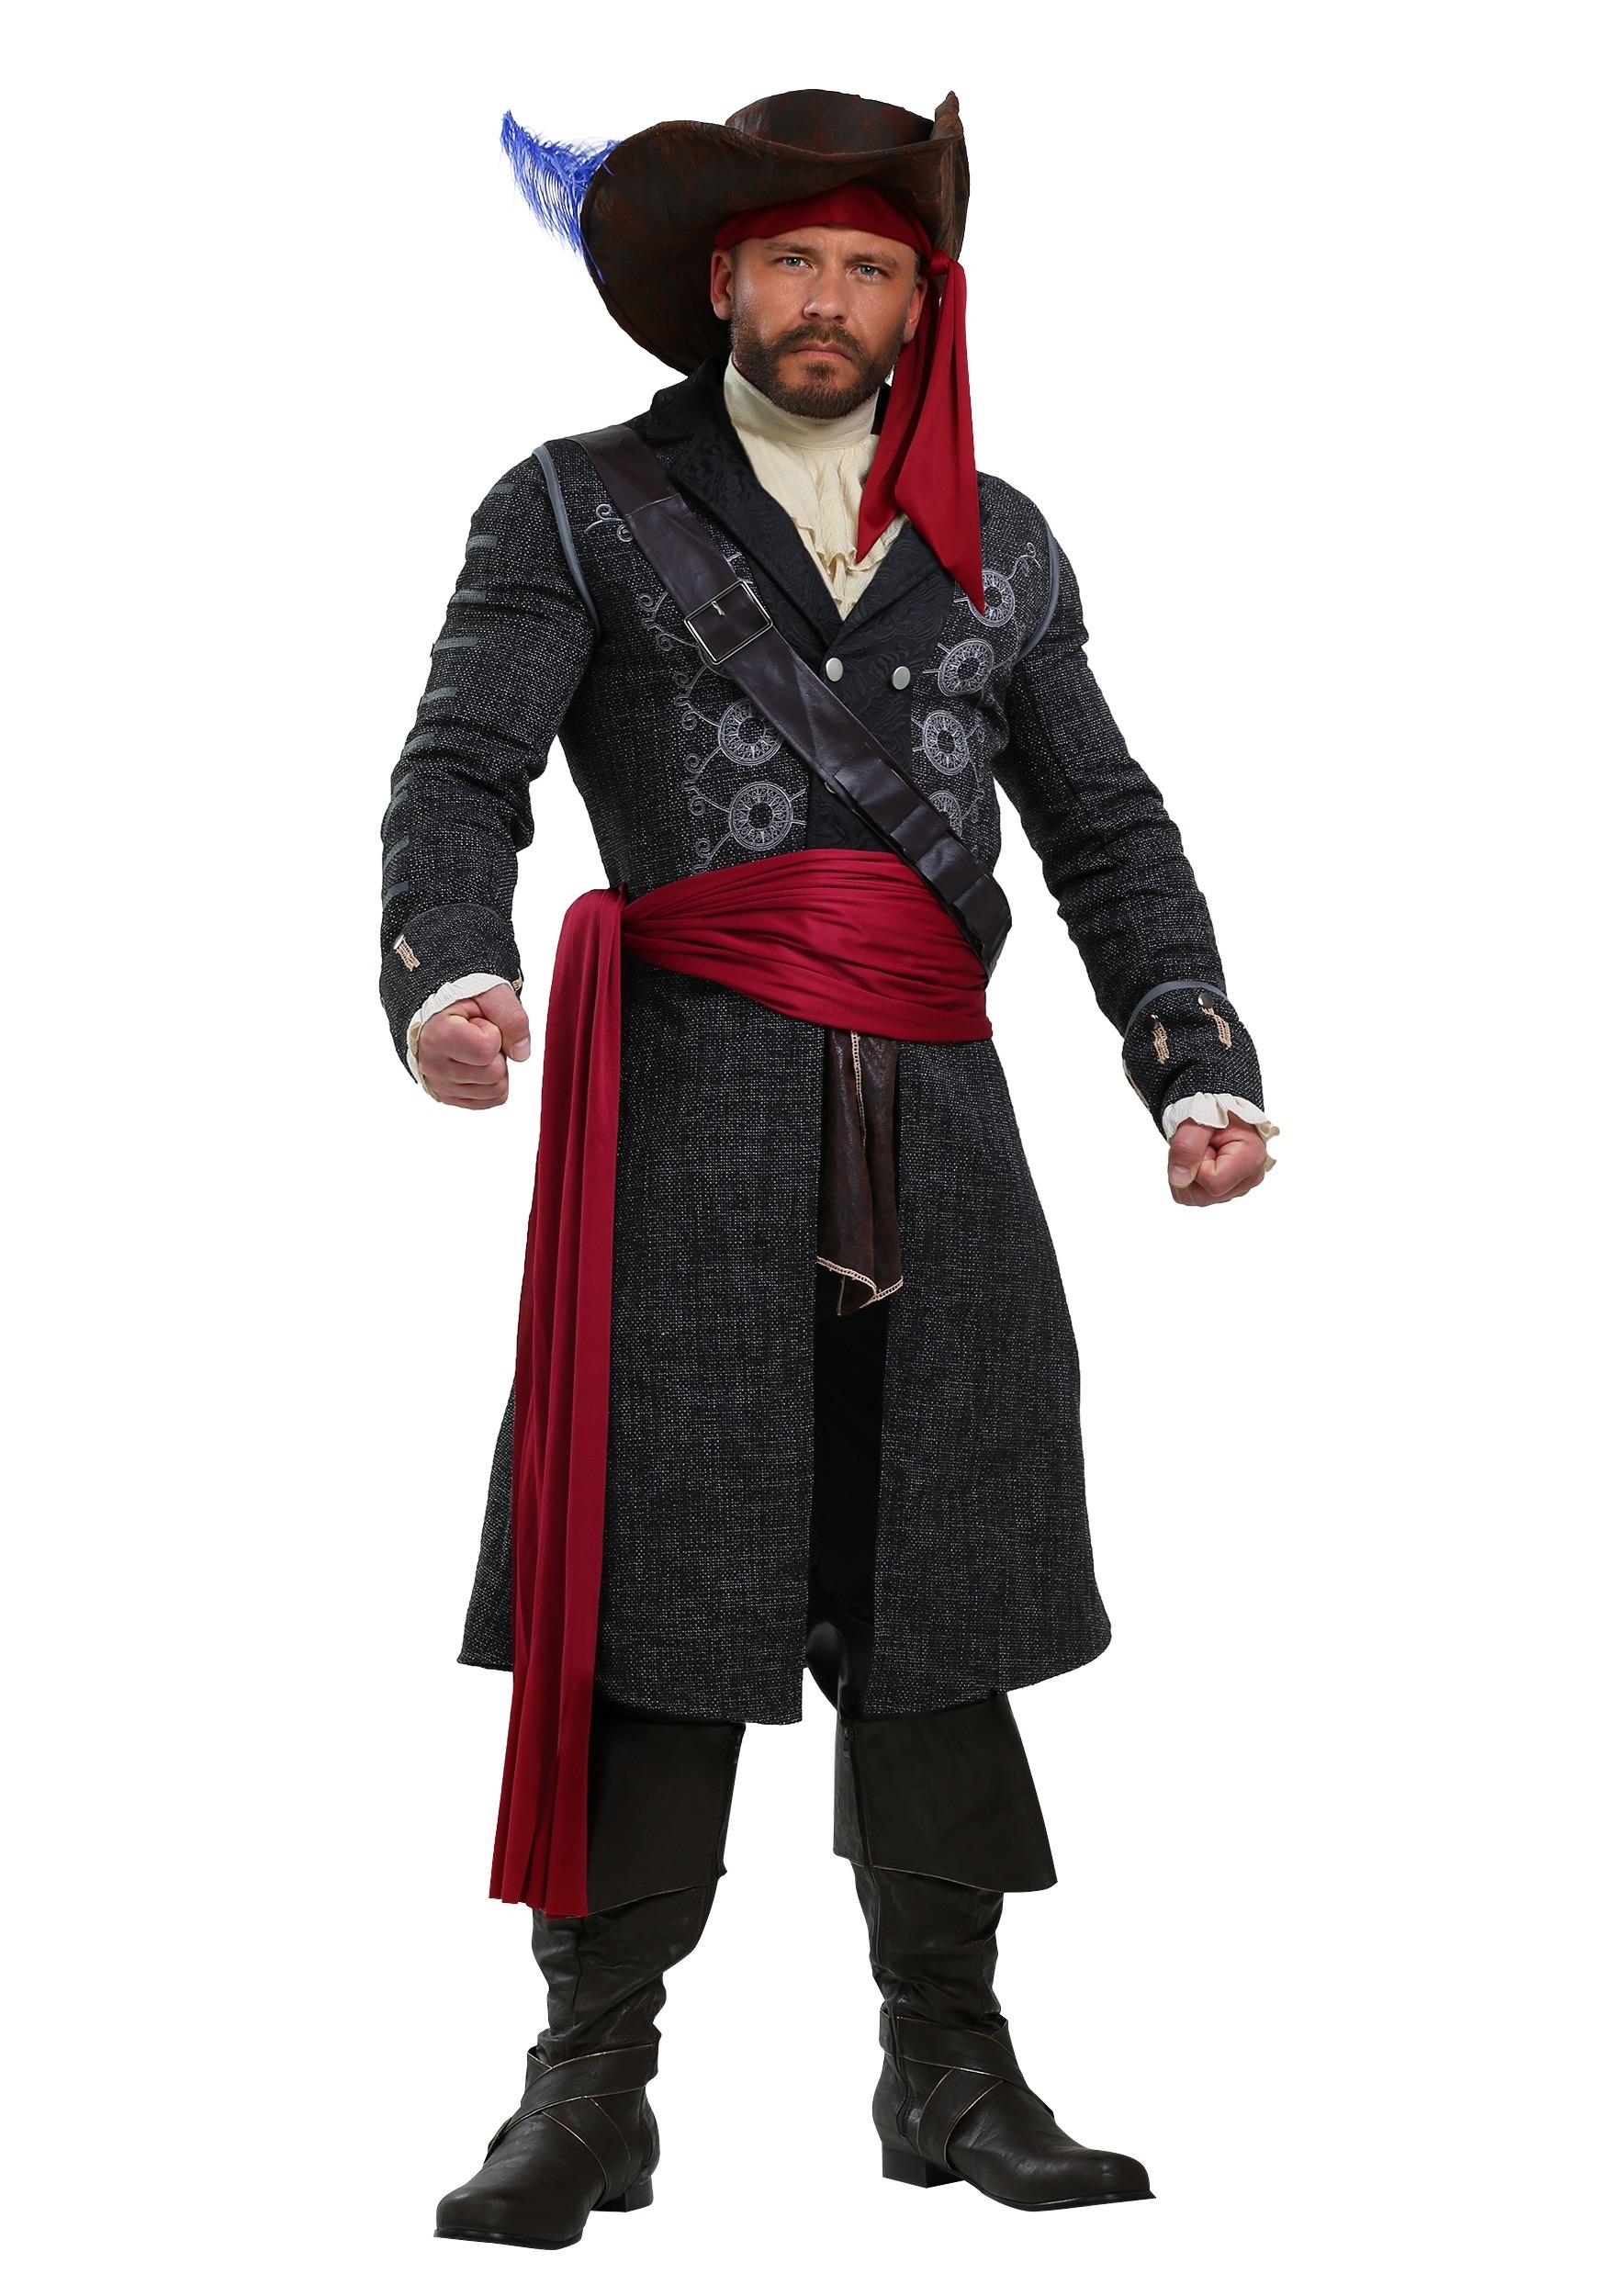 Blackbeard Men's Costume FUN2255AD